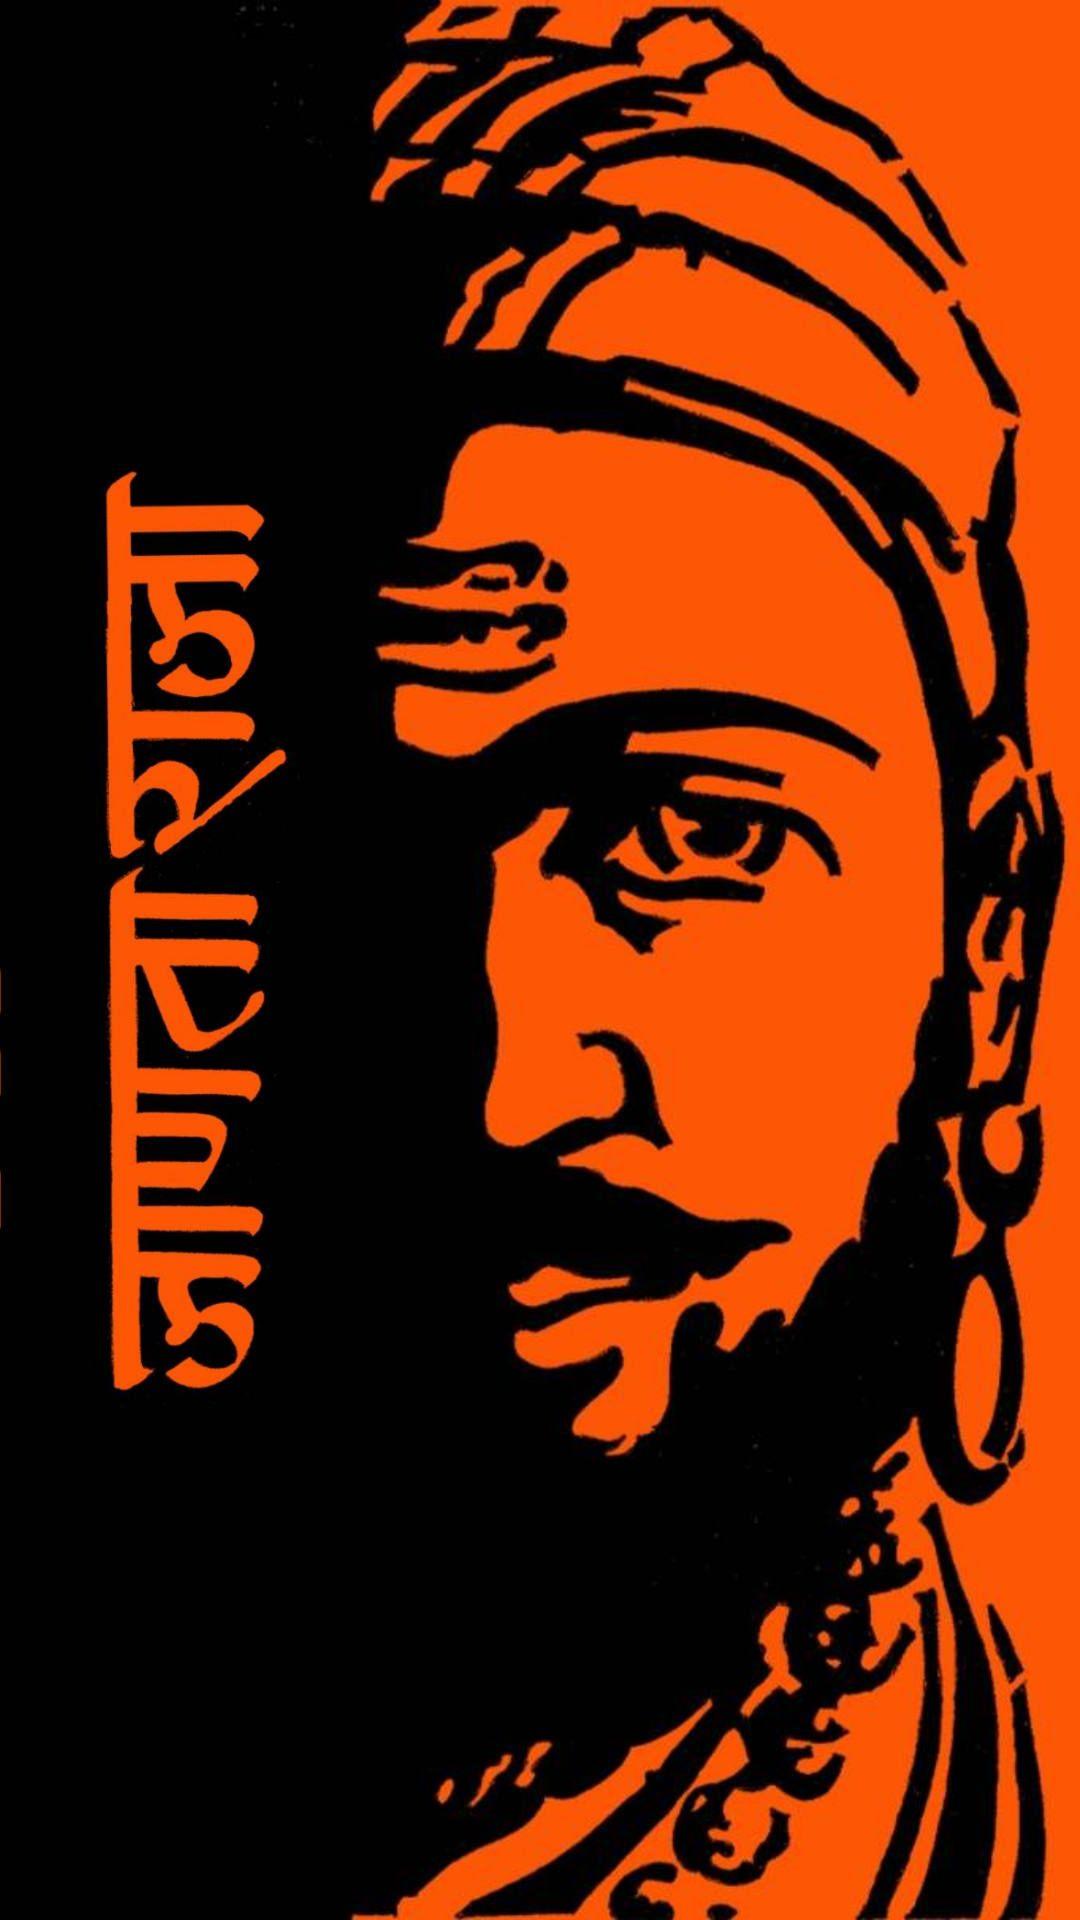 shivaji maharaj mobile wallpaper free download superman logo